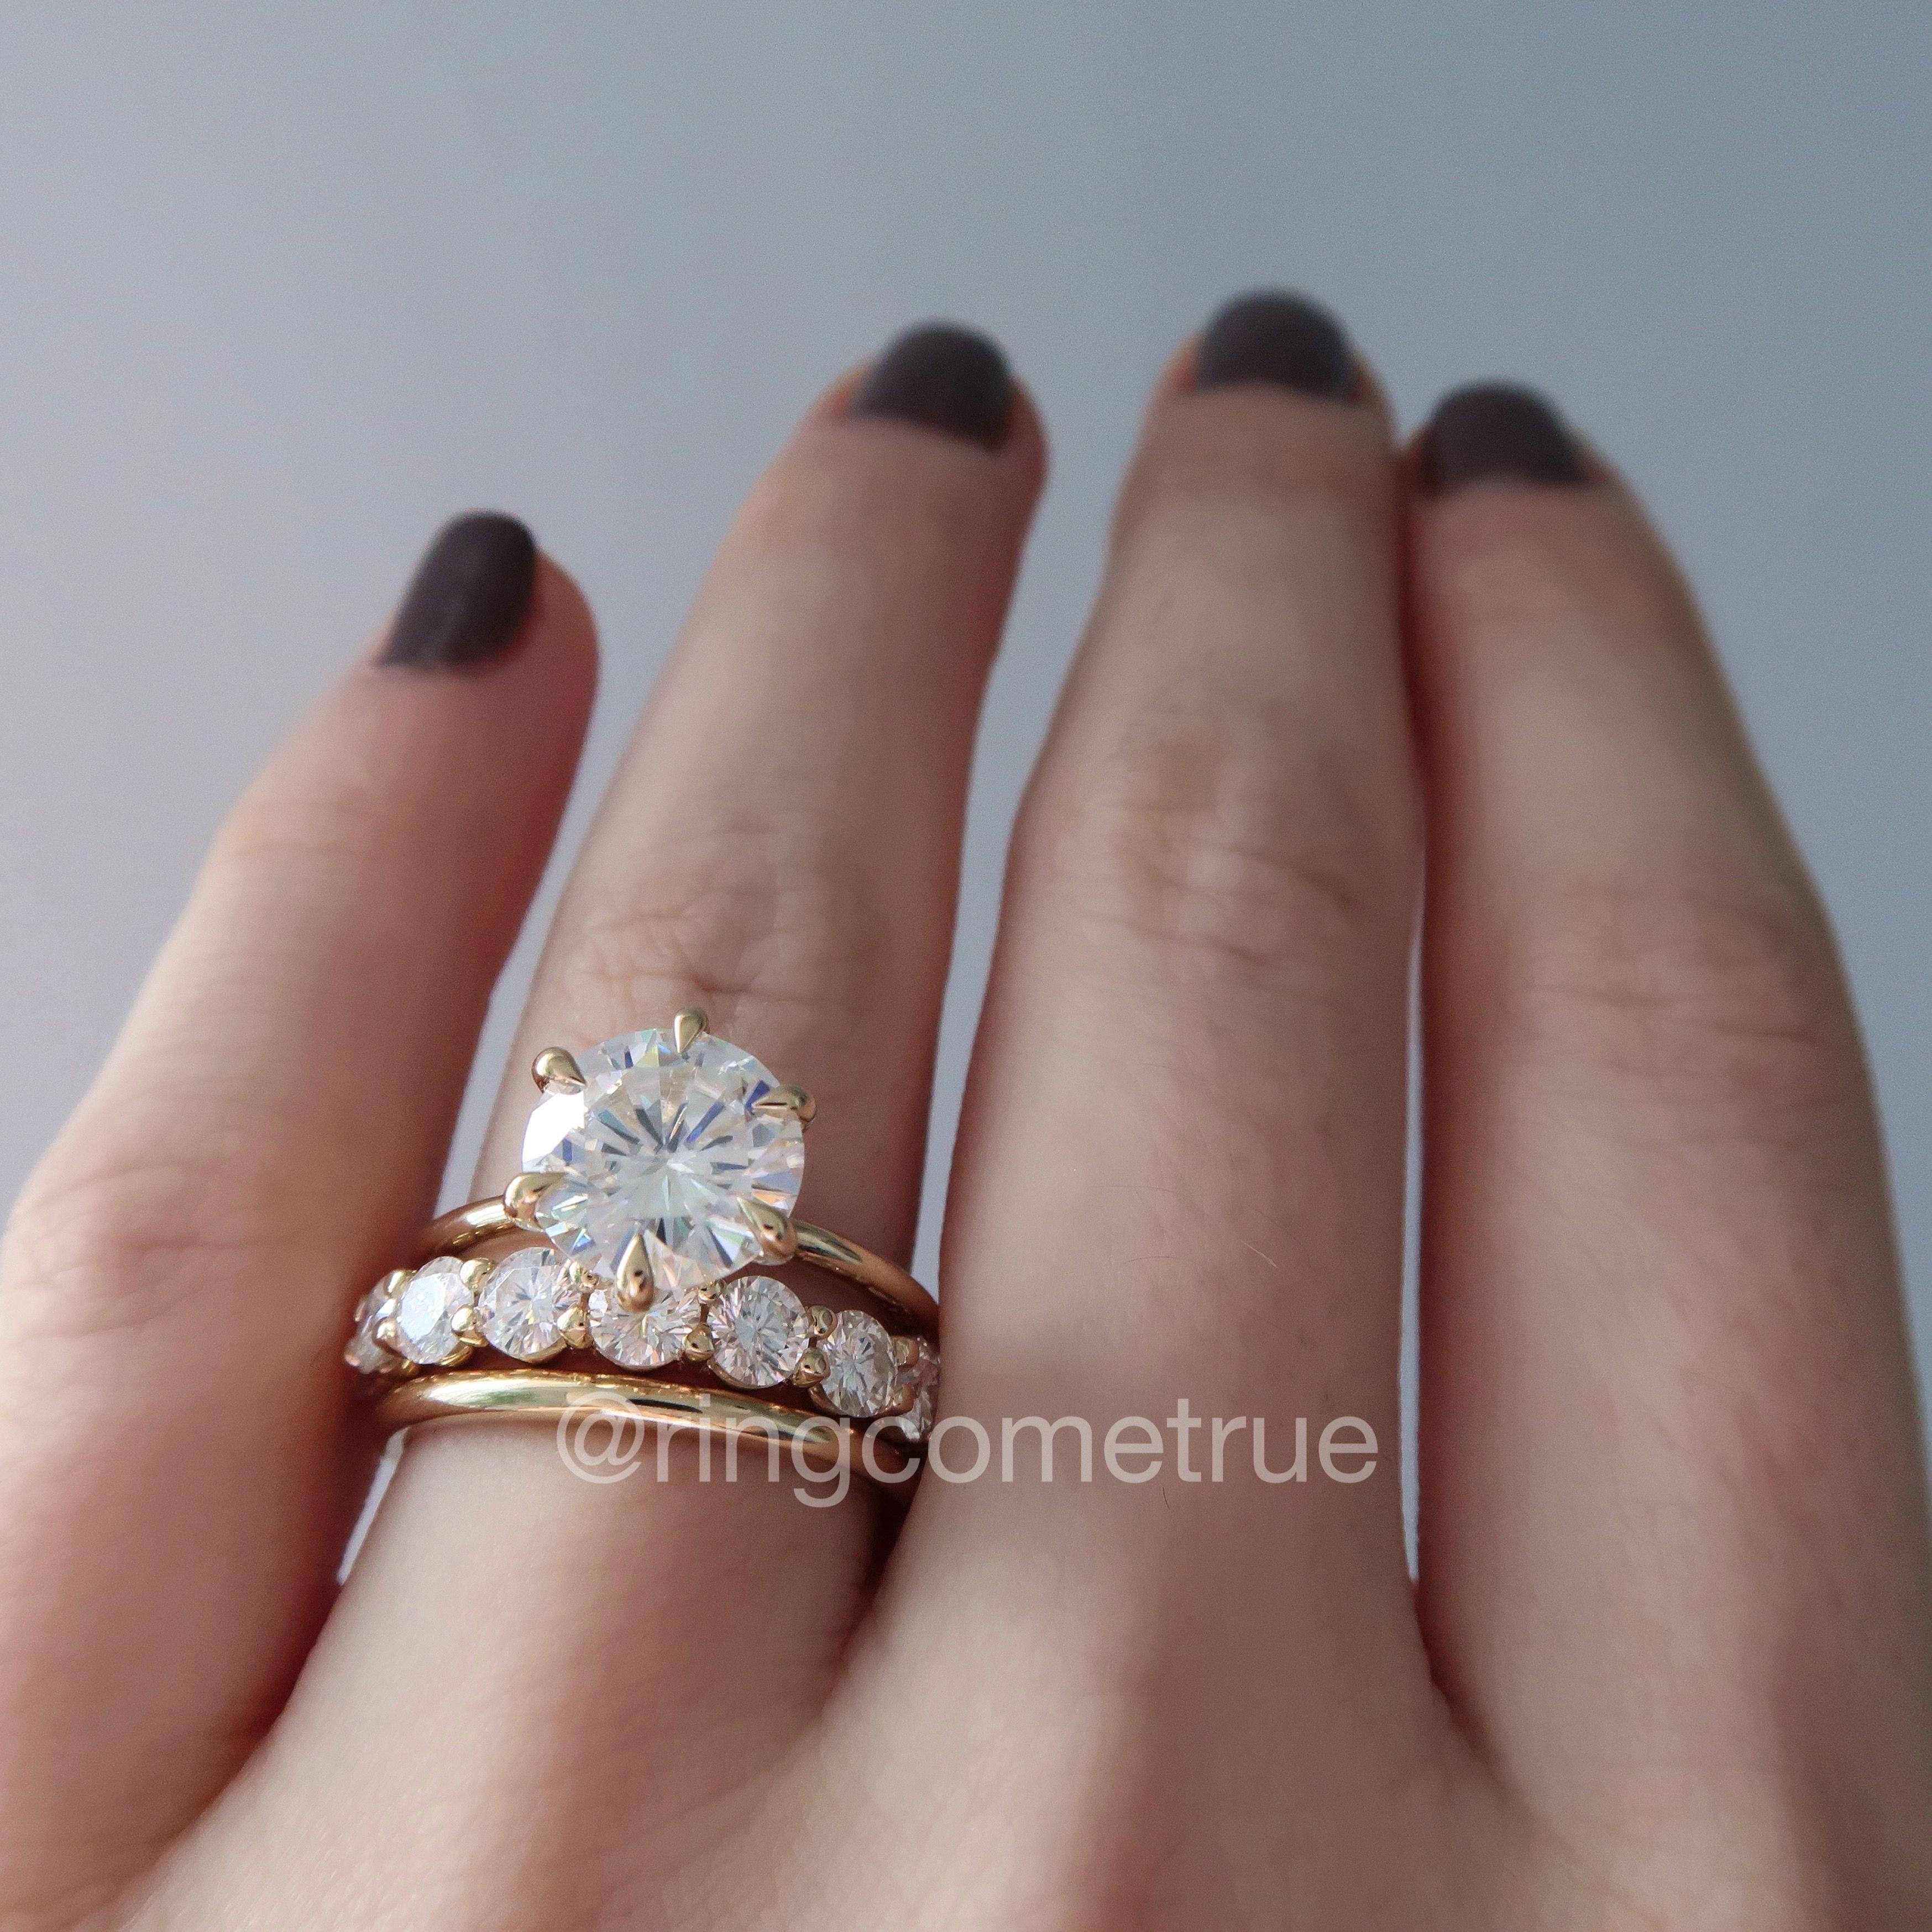 Moissanite Engagement Ring And Bridal Set Eternity Band Engagement Ring Yellow Gold Wedding Ring Wedding Ring Sets Round